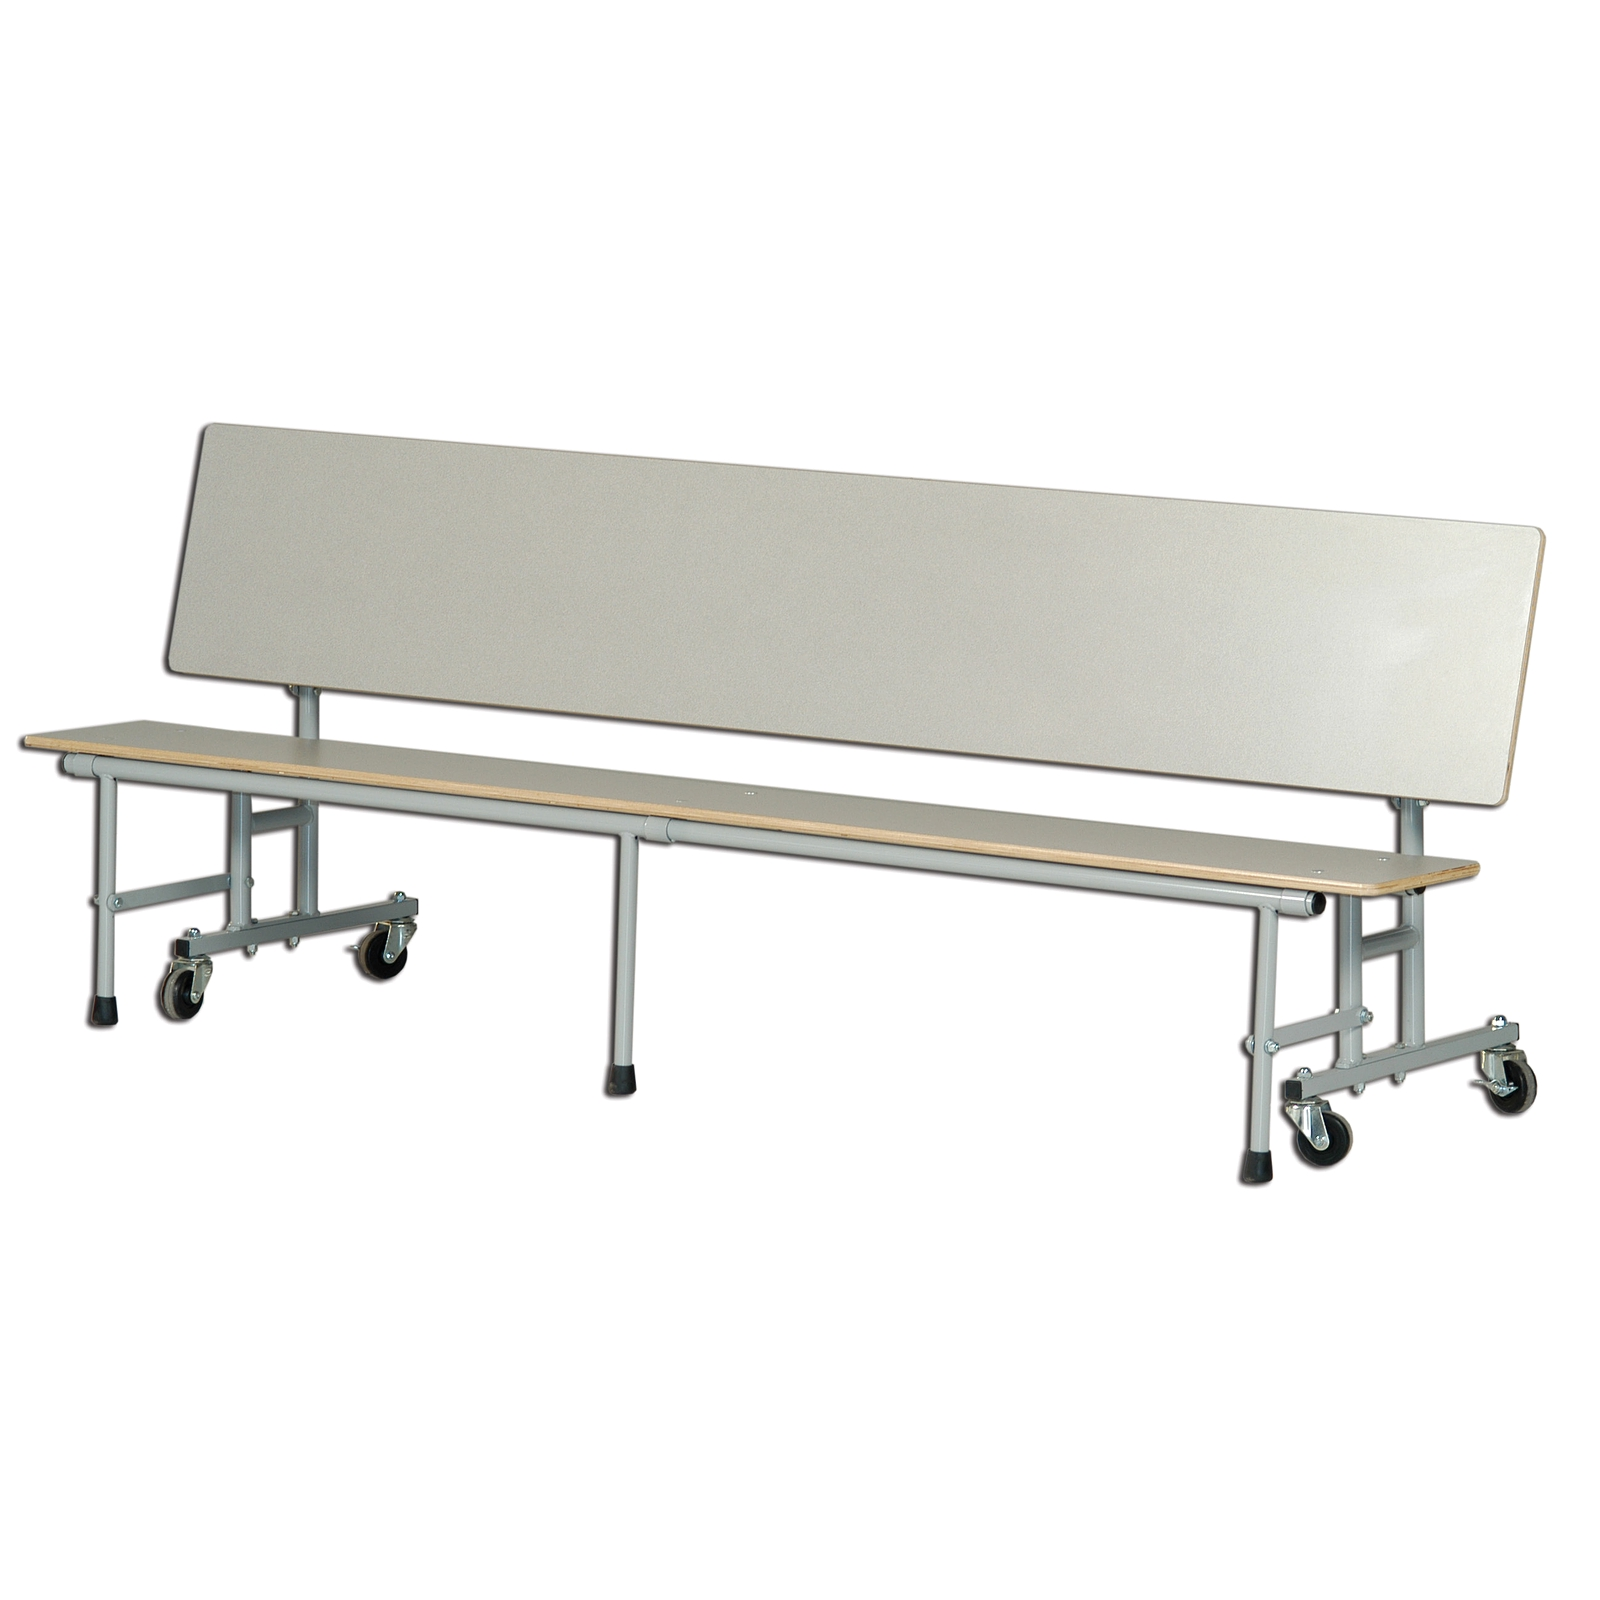 Table banc alpha vico for Table banc